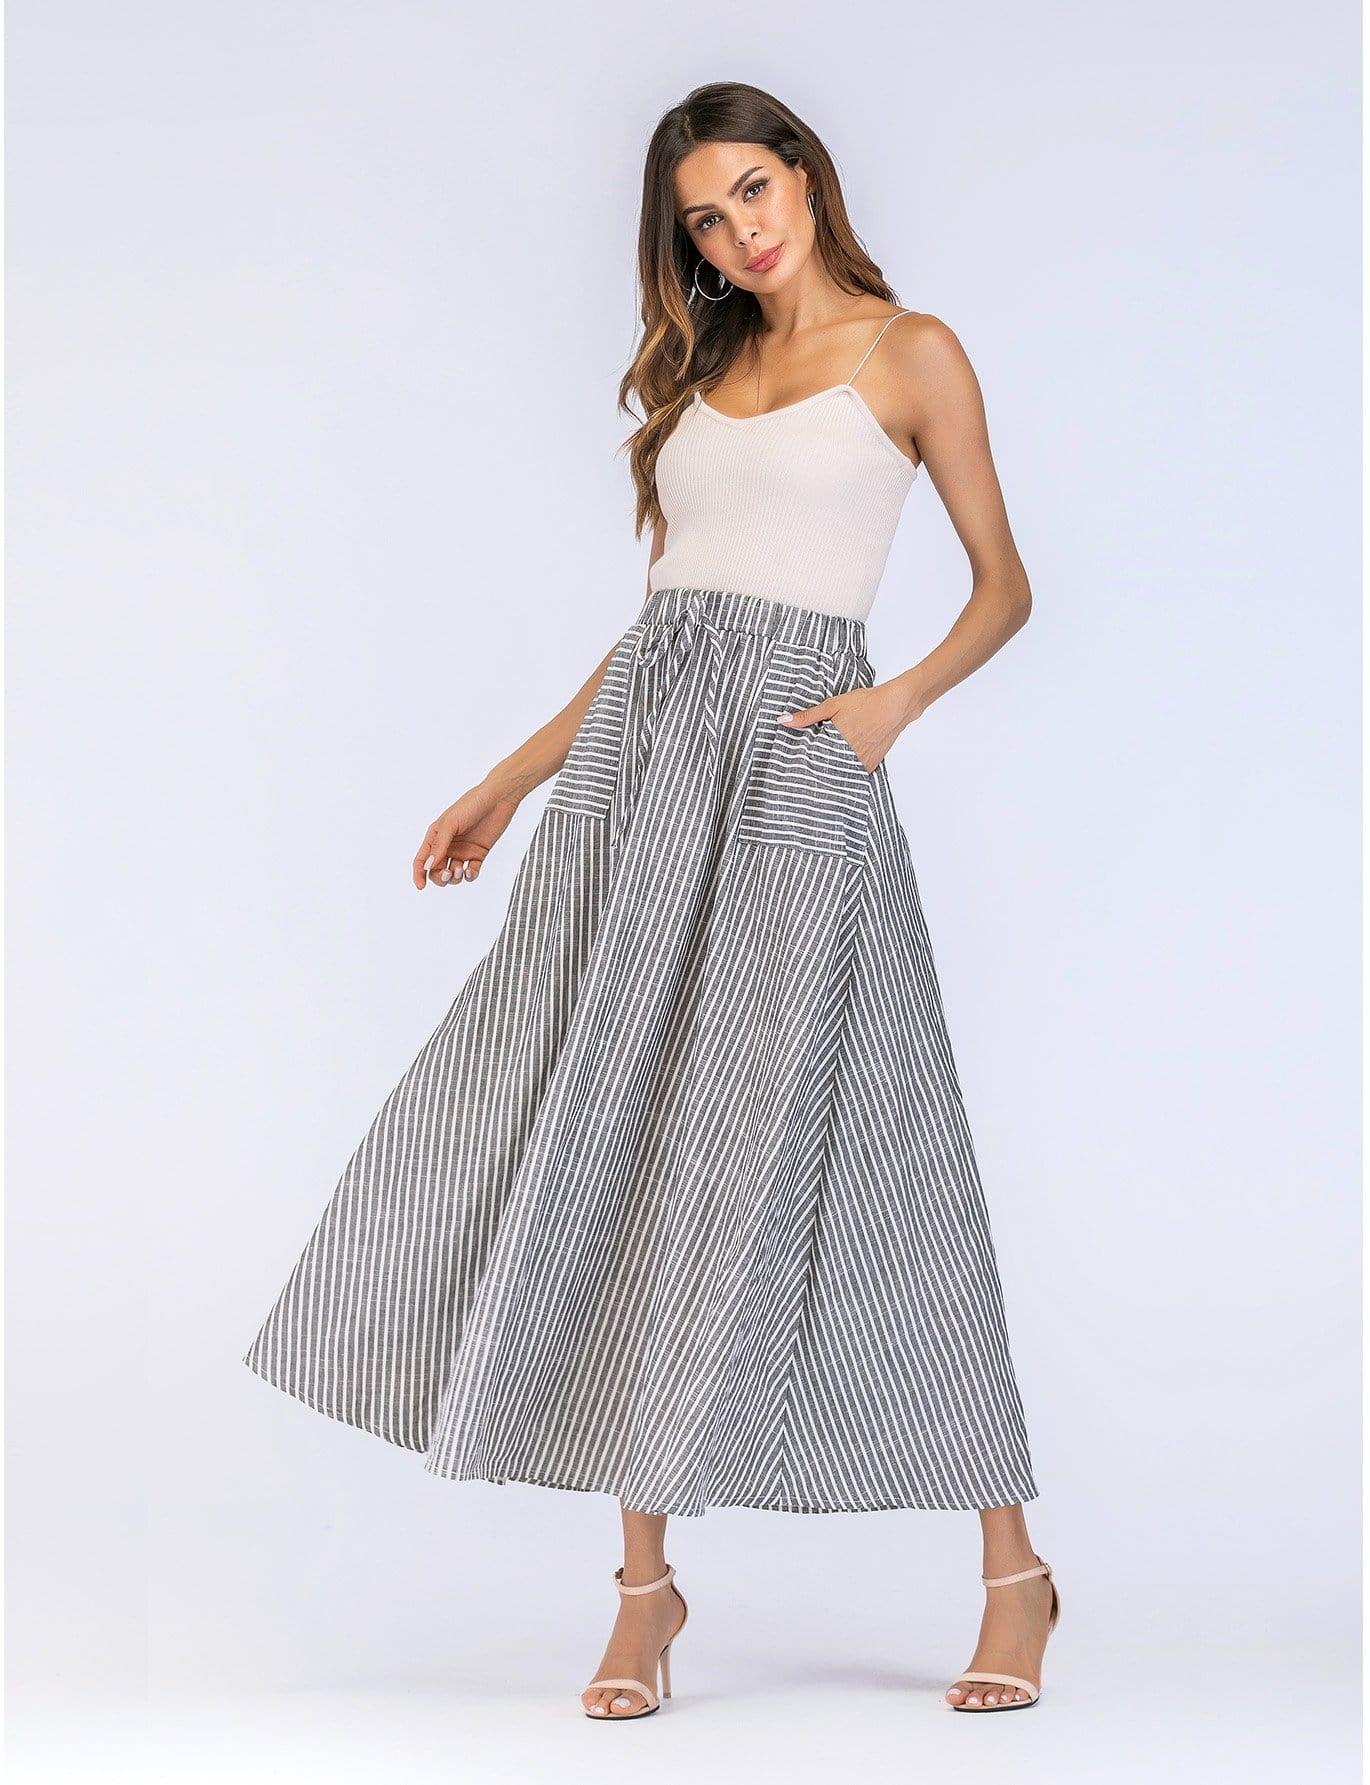 Drawstring Waist Stripe Skirt